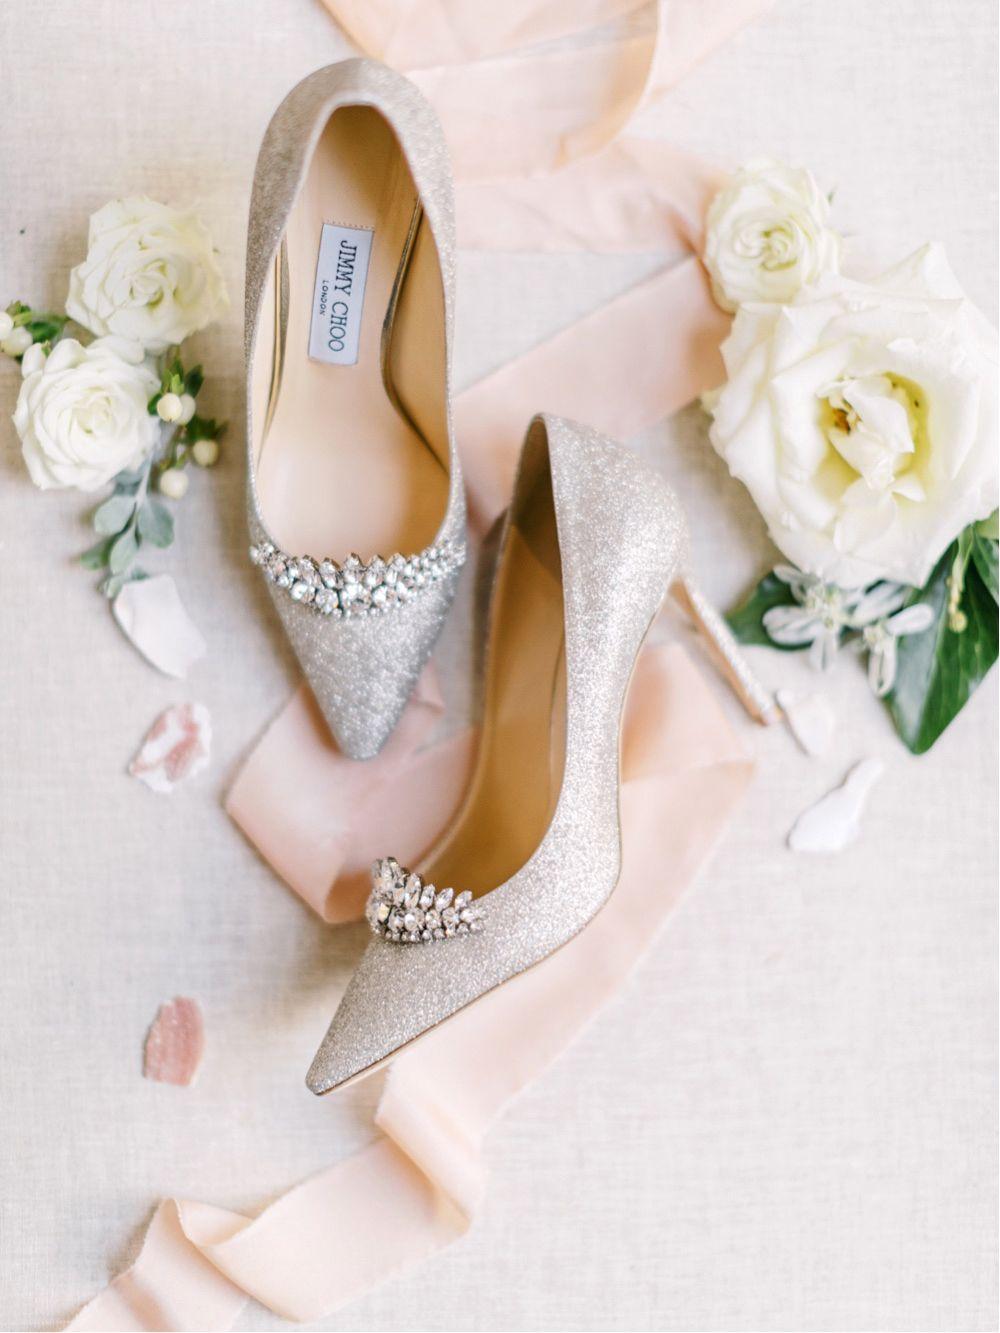 Jimmy Choo Wedding Shoes Jimmy Choo Wedding Shoes Jimmy Choo Wedding Jimmy Choo Bridal